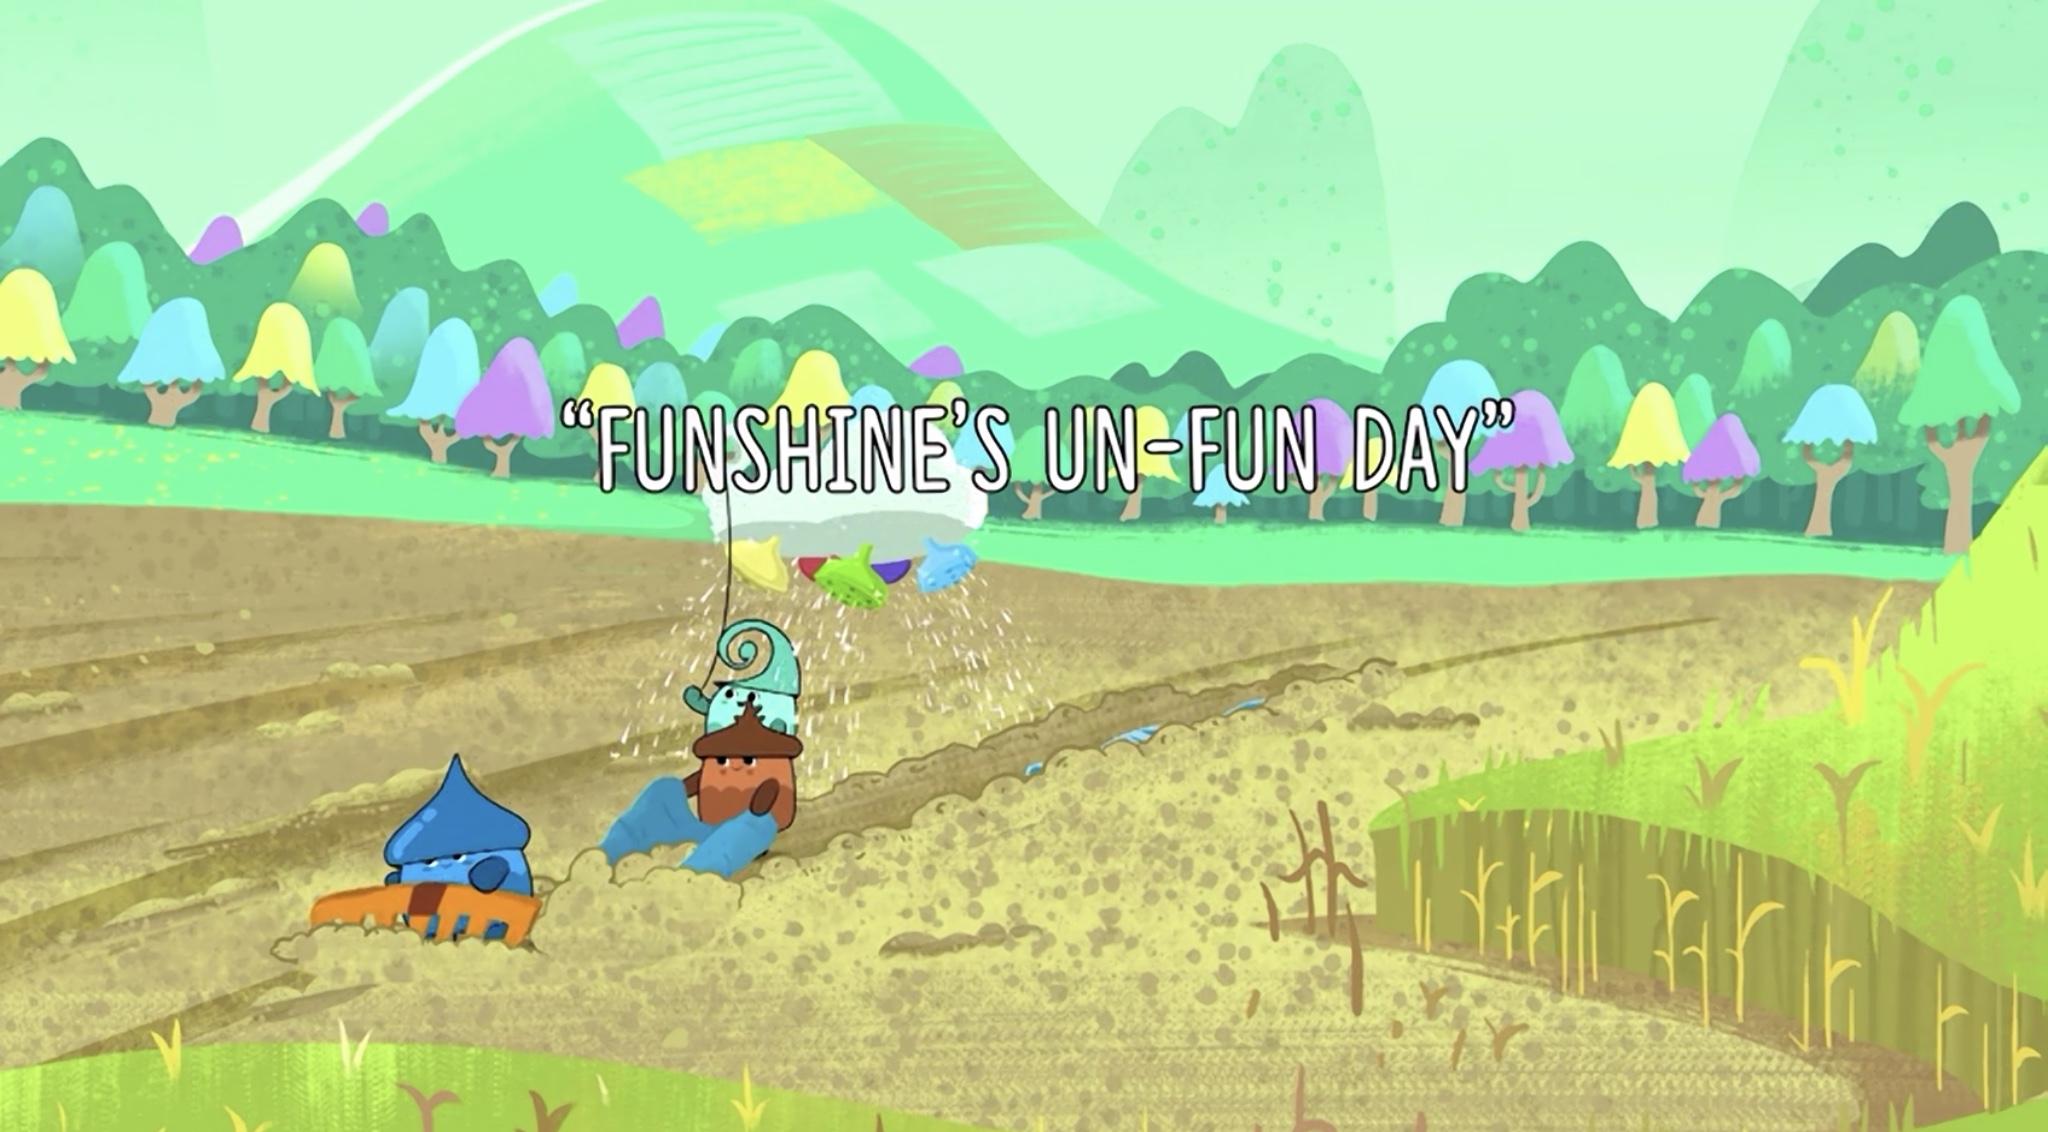 Funshine's Unfun Day